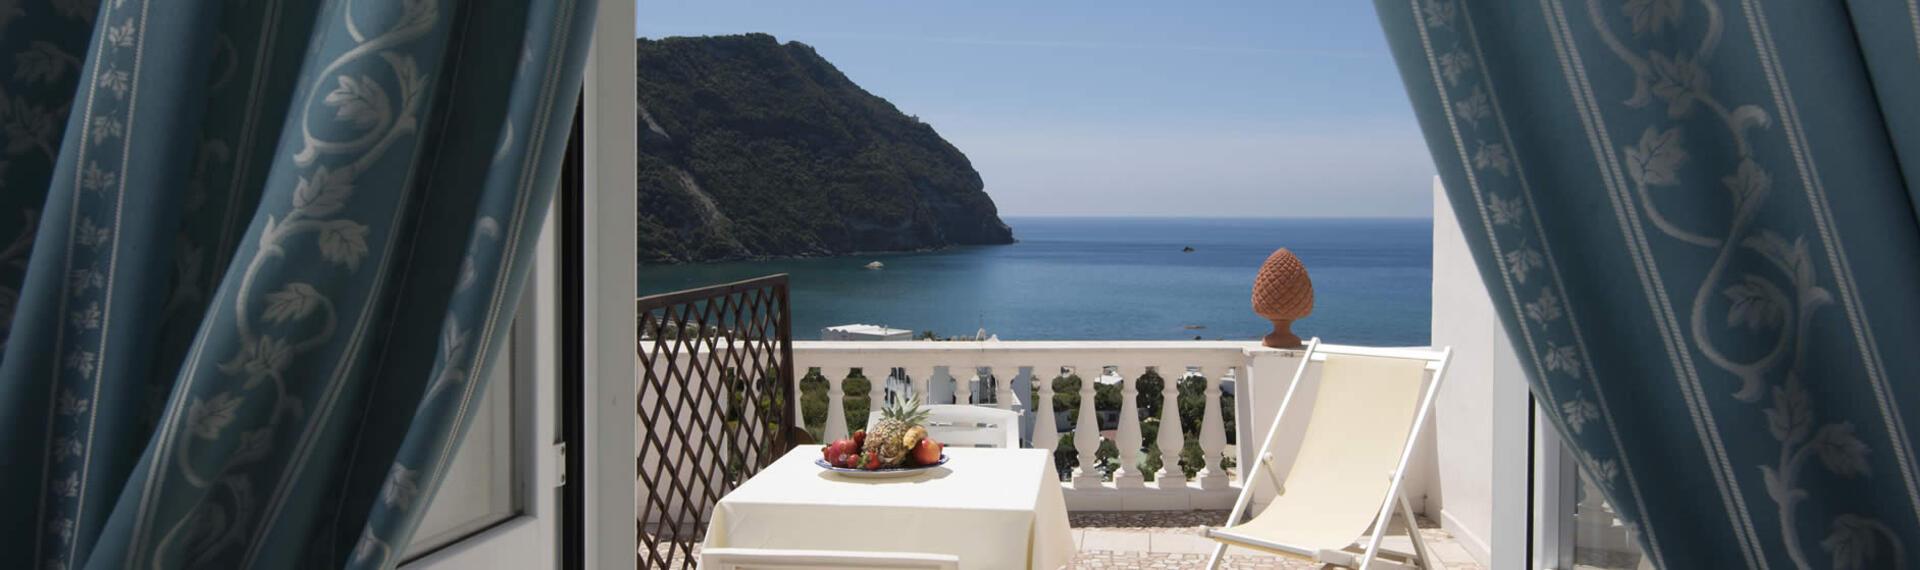 hotelvillabianca en where-we-are-located 009